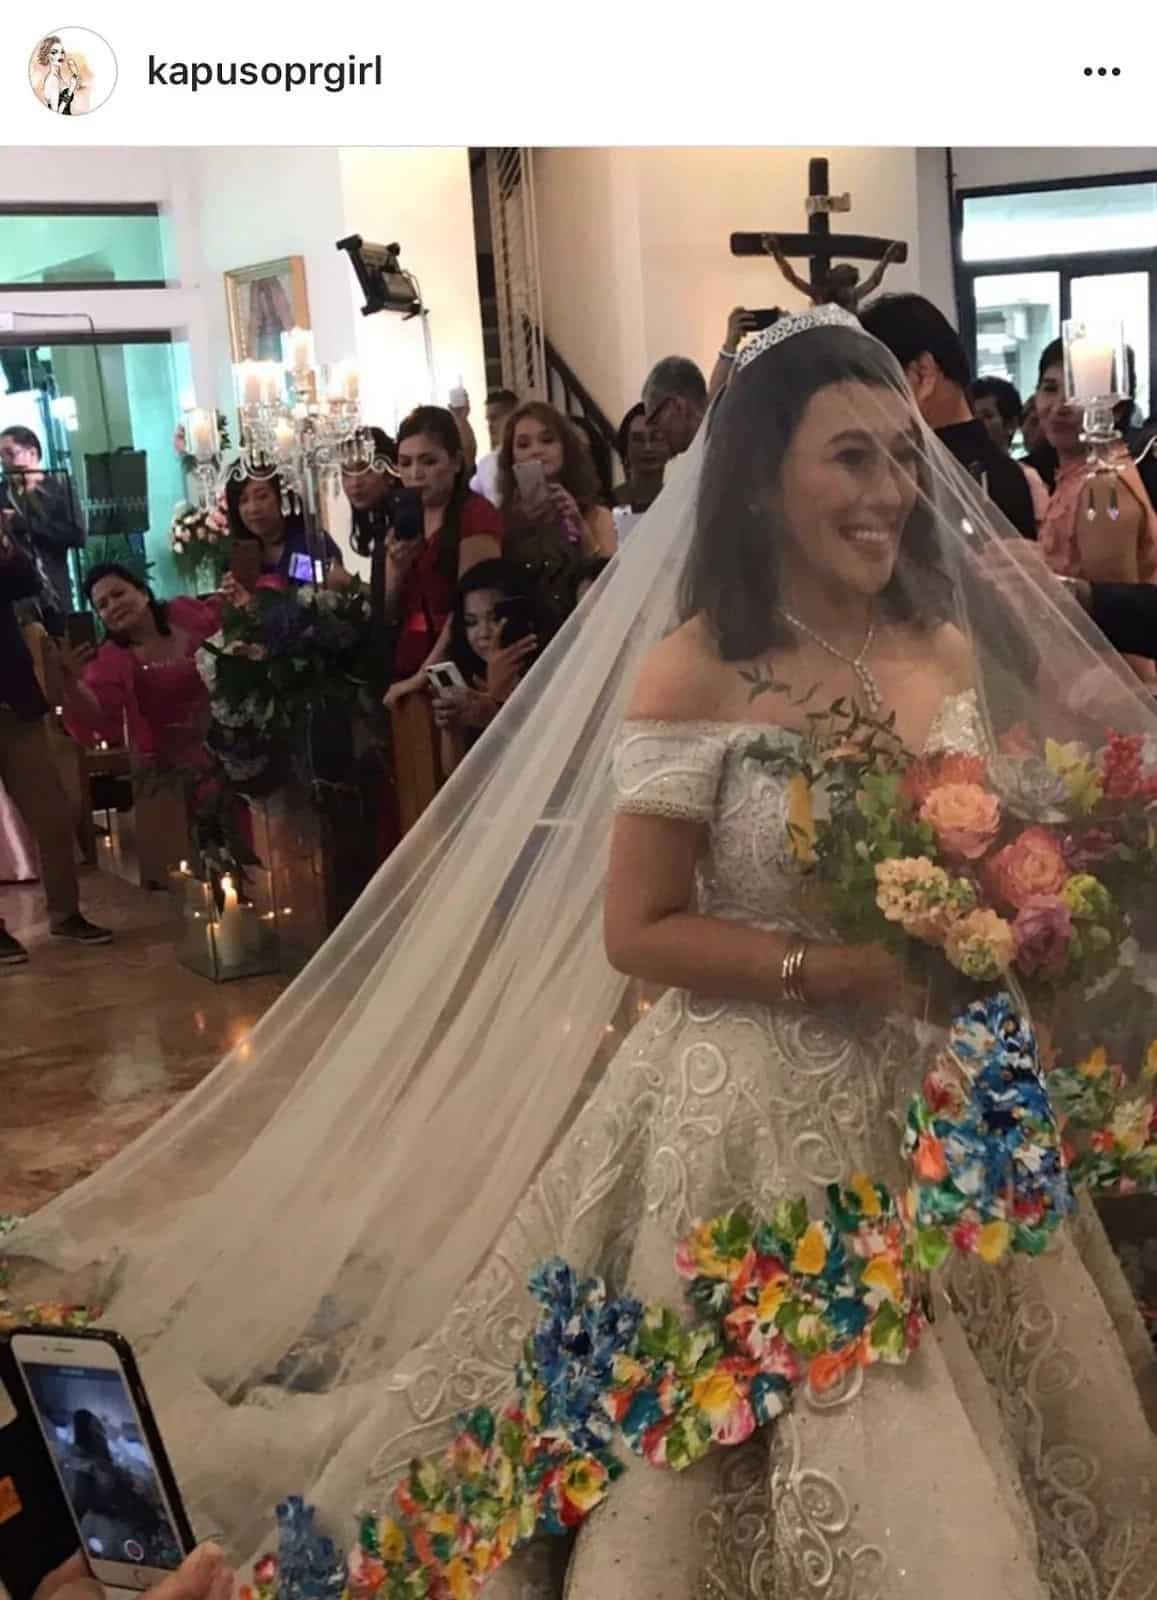 Photos & video from inside the church where Ai-Ai delas Alas & Gerald Sibayan got married go viral